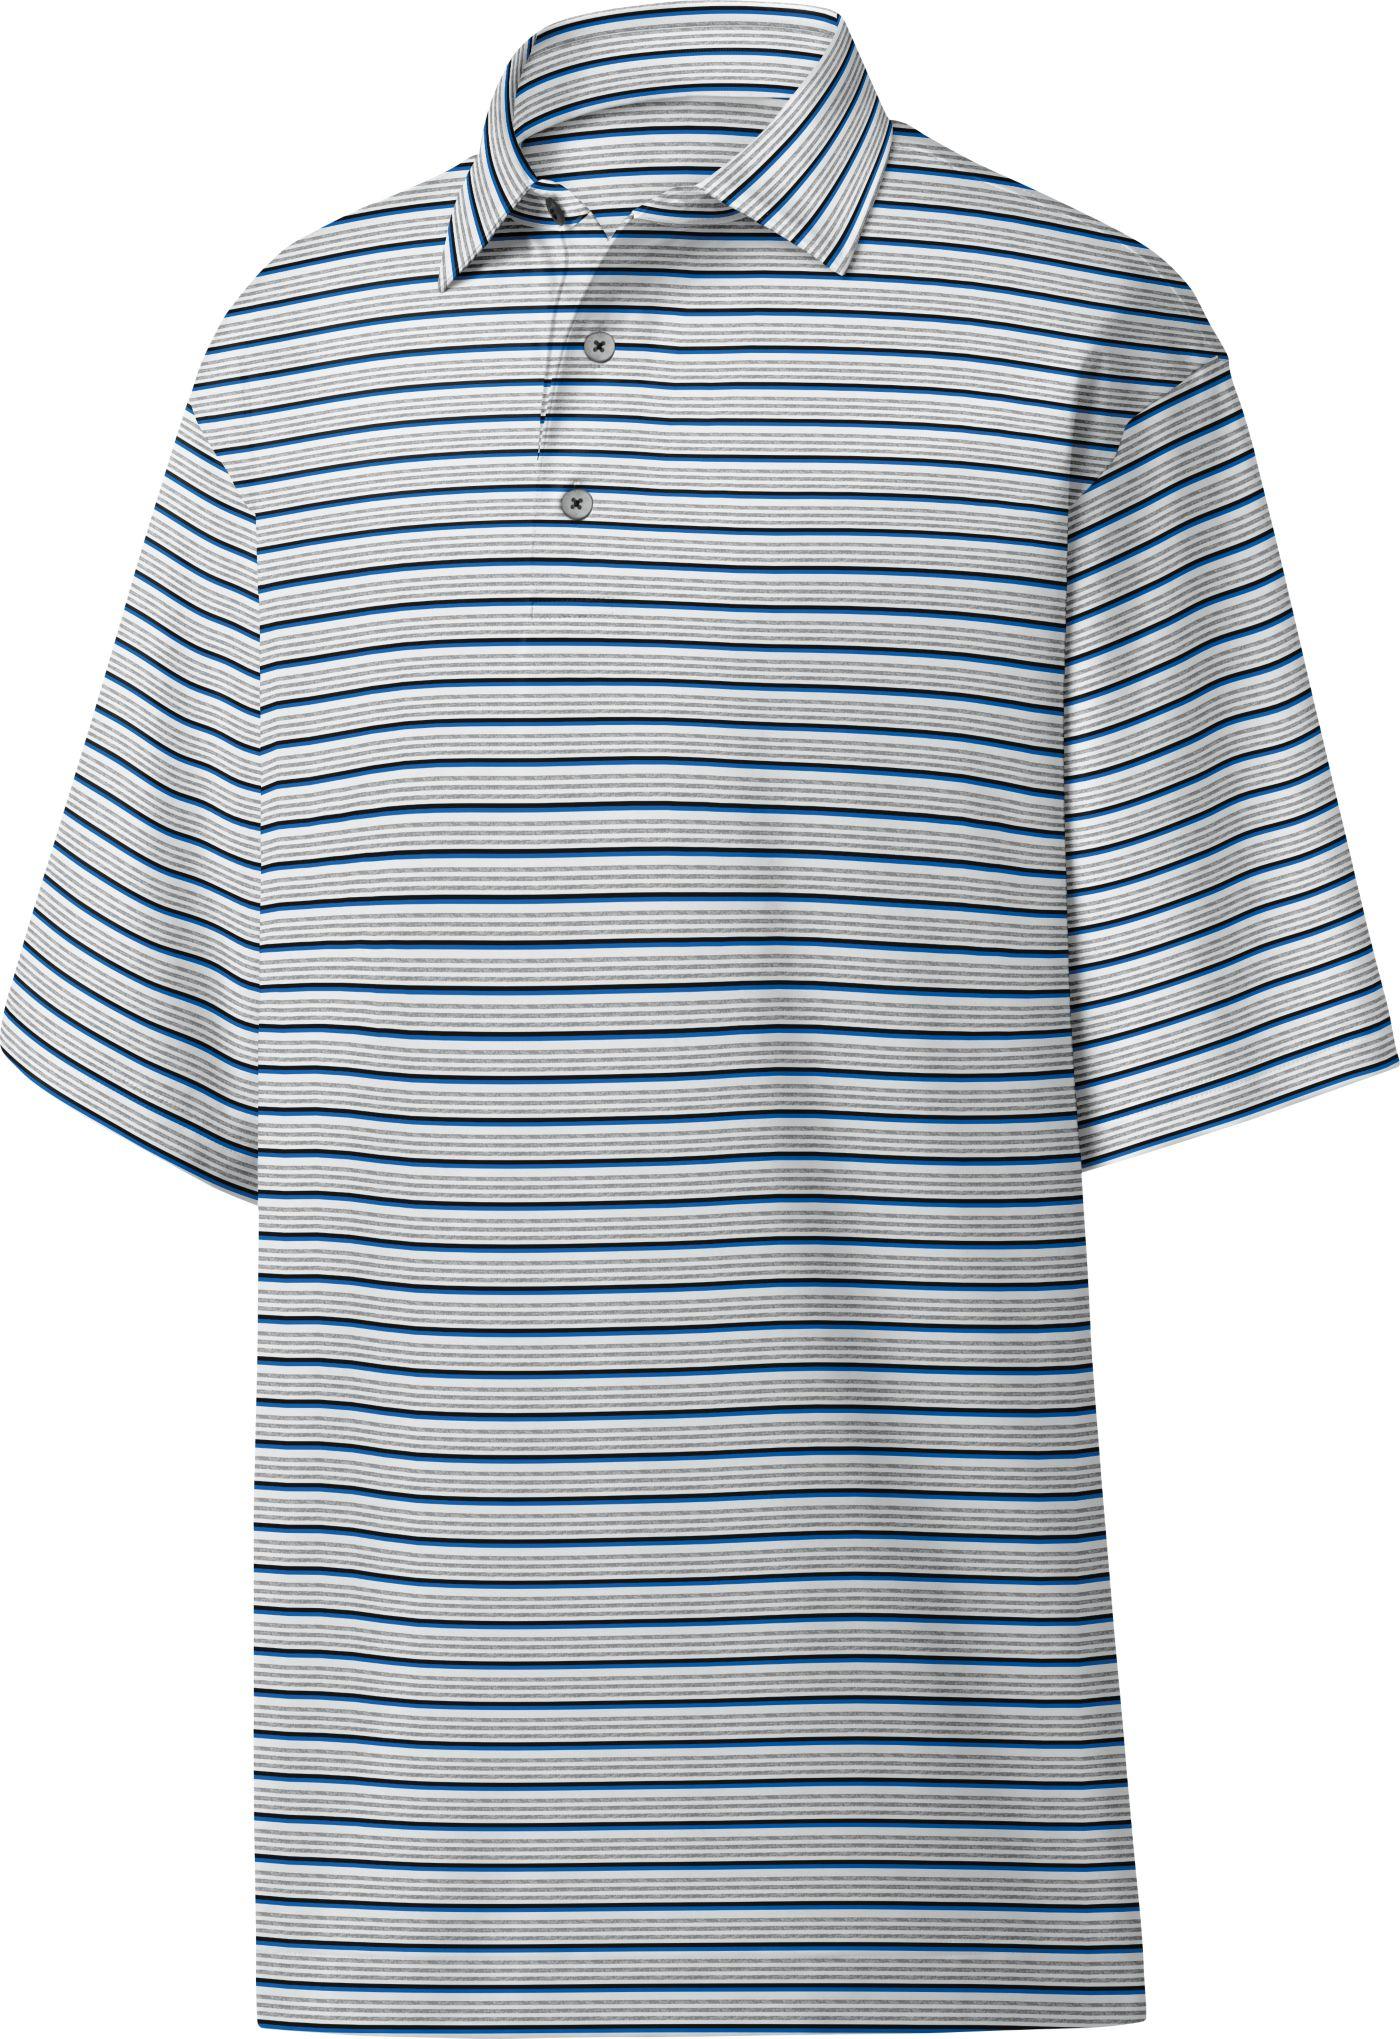 FootJoy Men's Lisle Multi Stripe Golf Polo